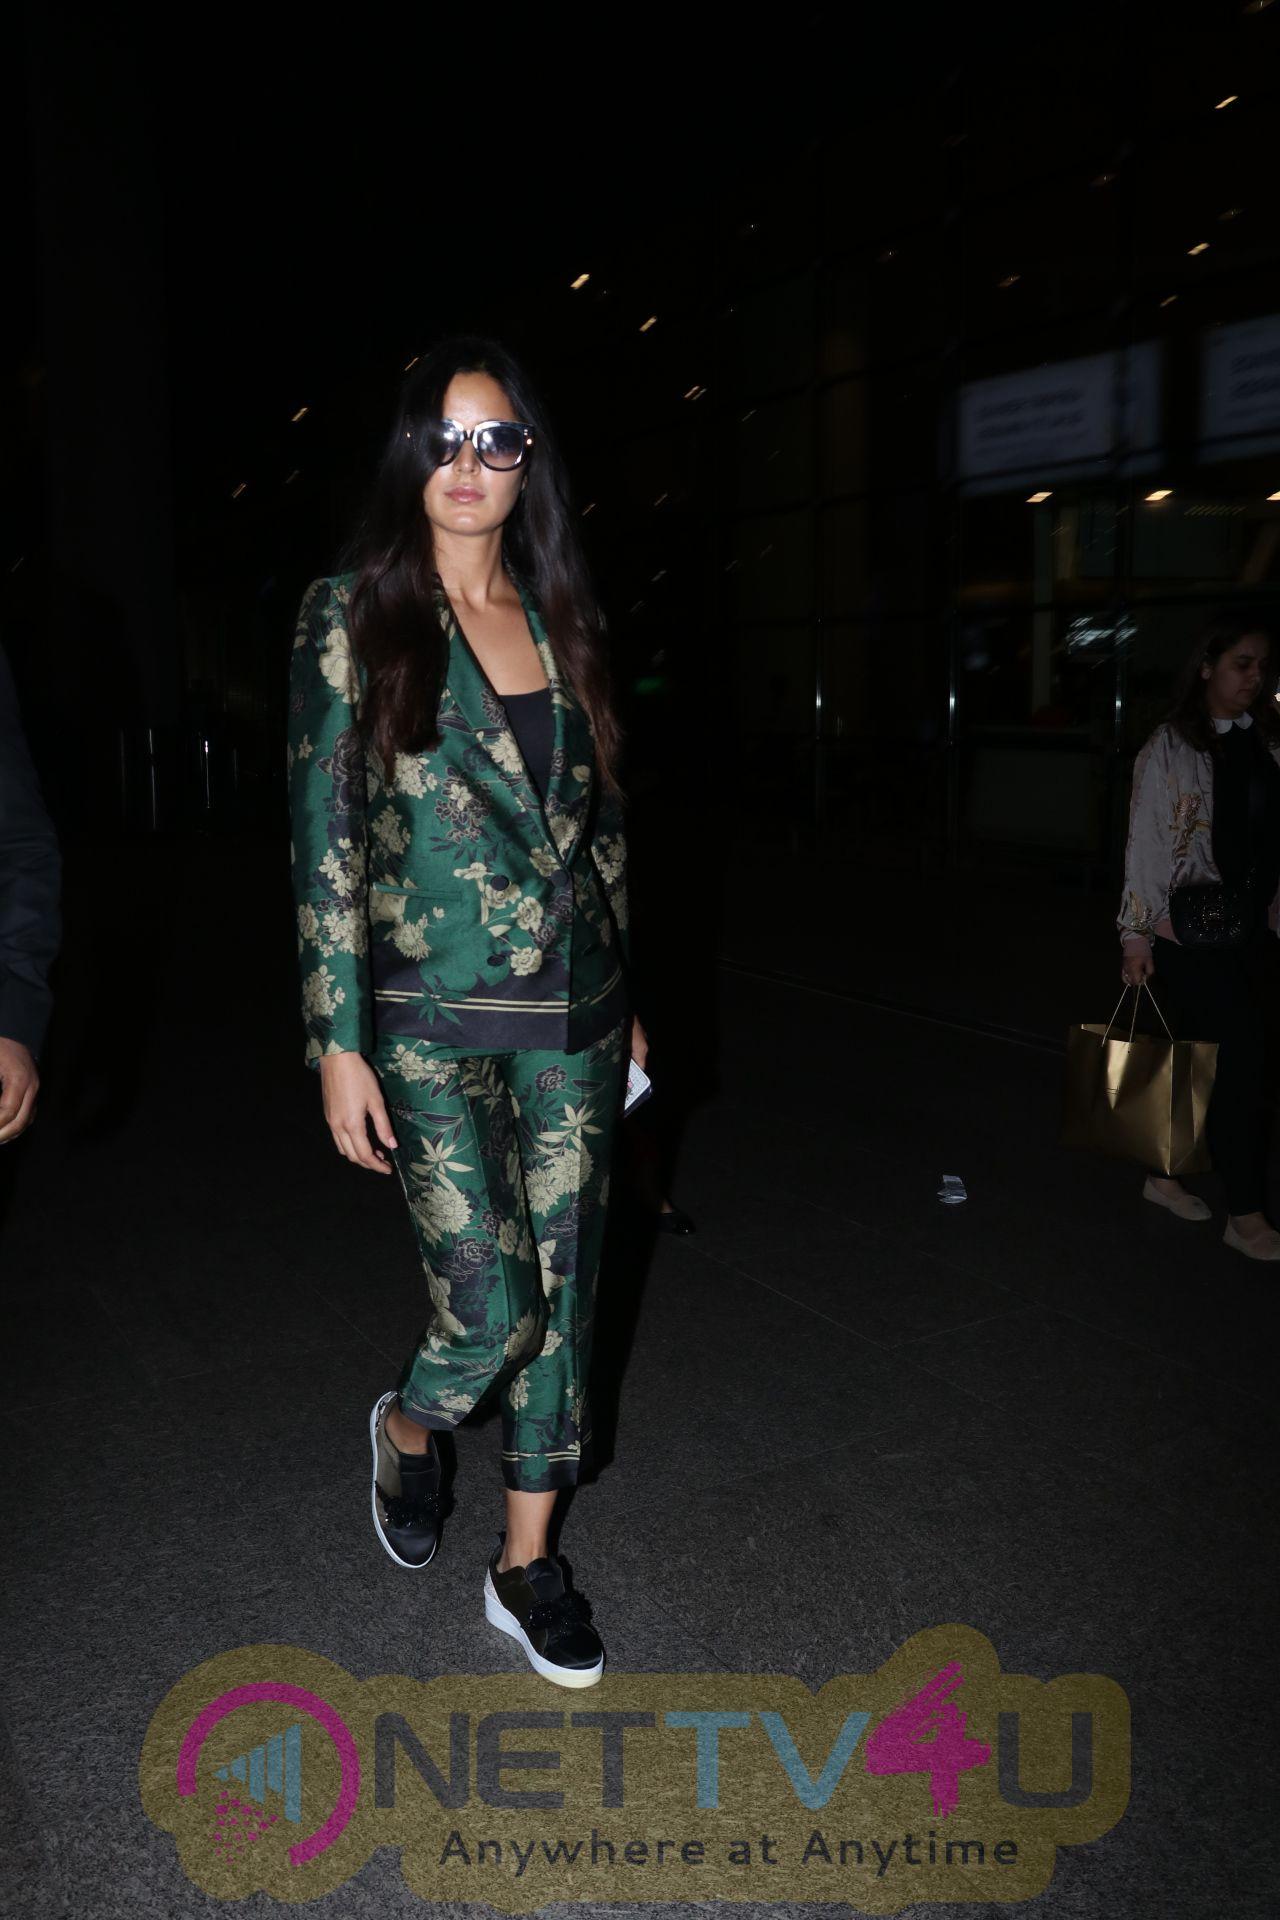 Actress Katrina Kaif Spotted At The Airport Images